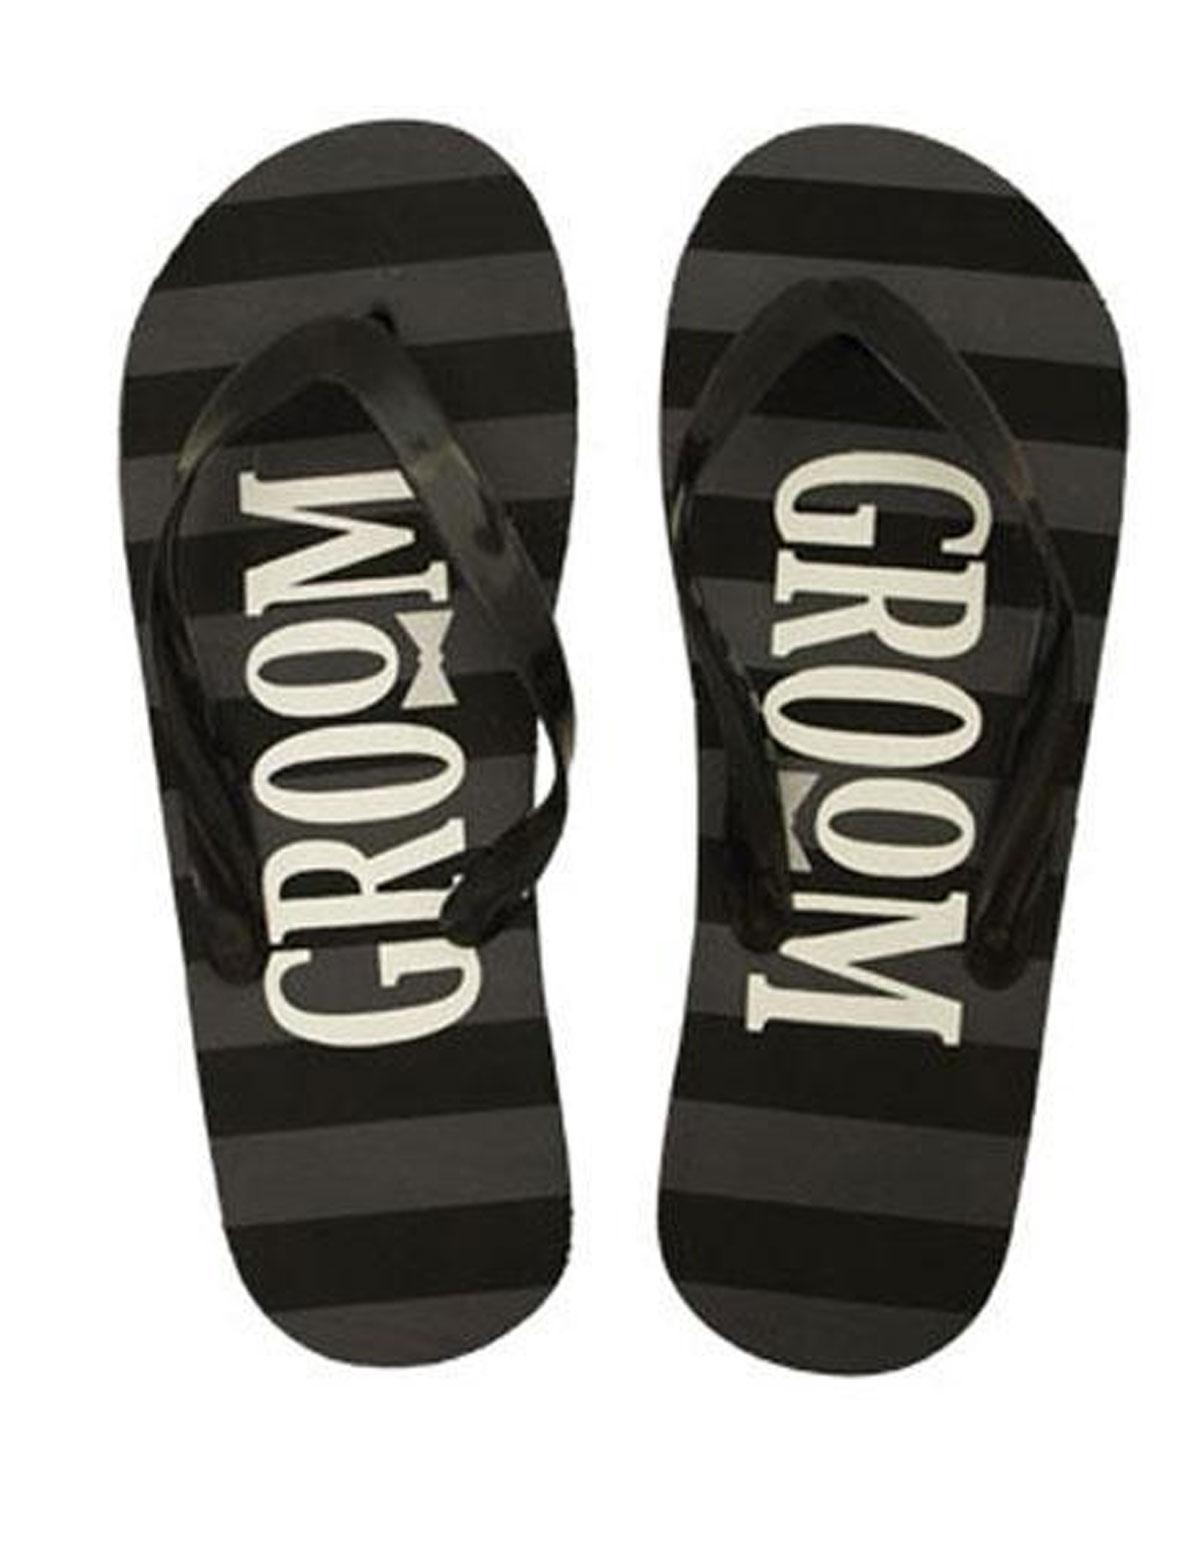 Groom Flip Flop